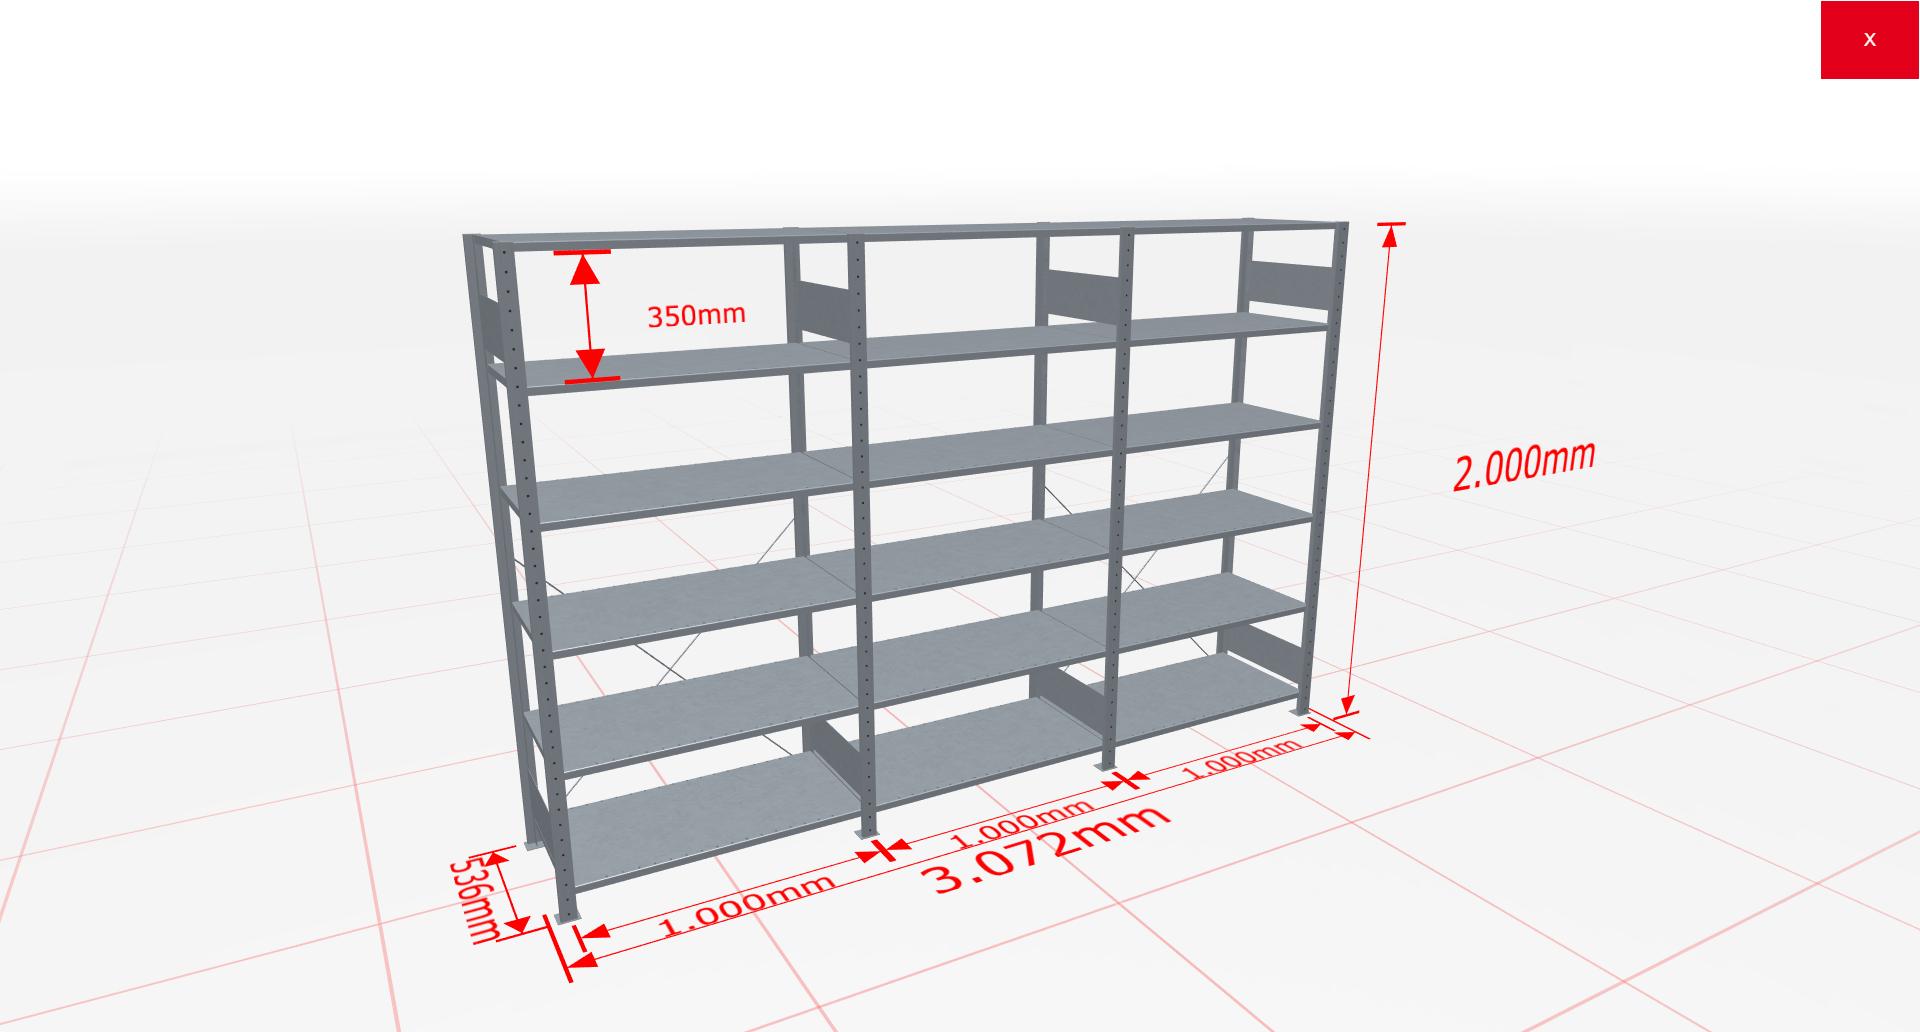 Fachbodenregal Komplettregal 2000x3072x500 mm (HxBxT) SCHULTE Lagertechnik verzinkt 6 Ebenen  150 kg je Boden